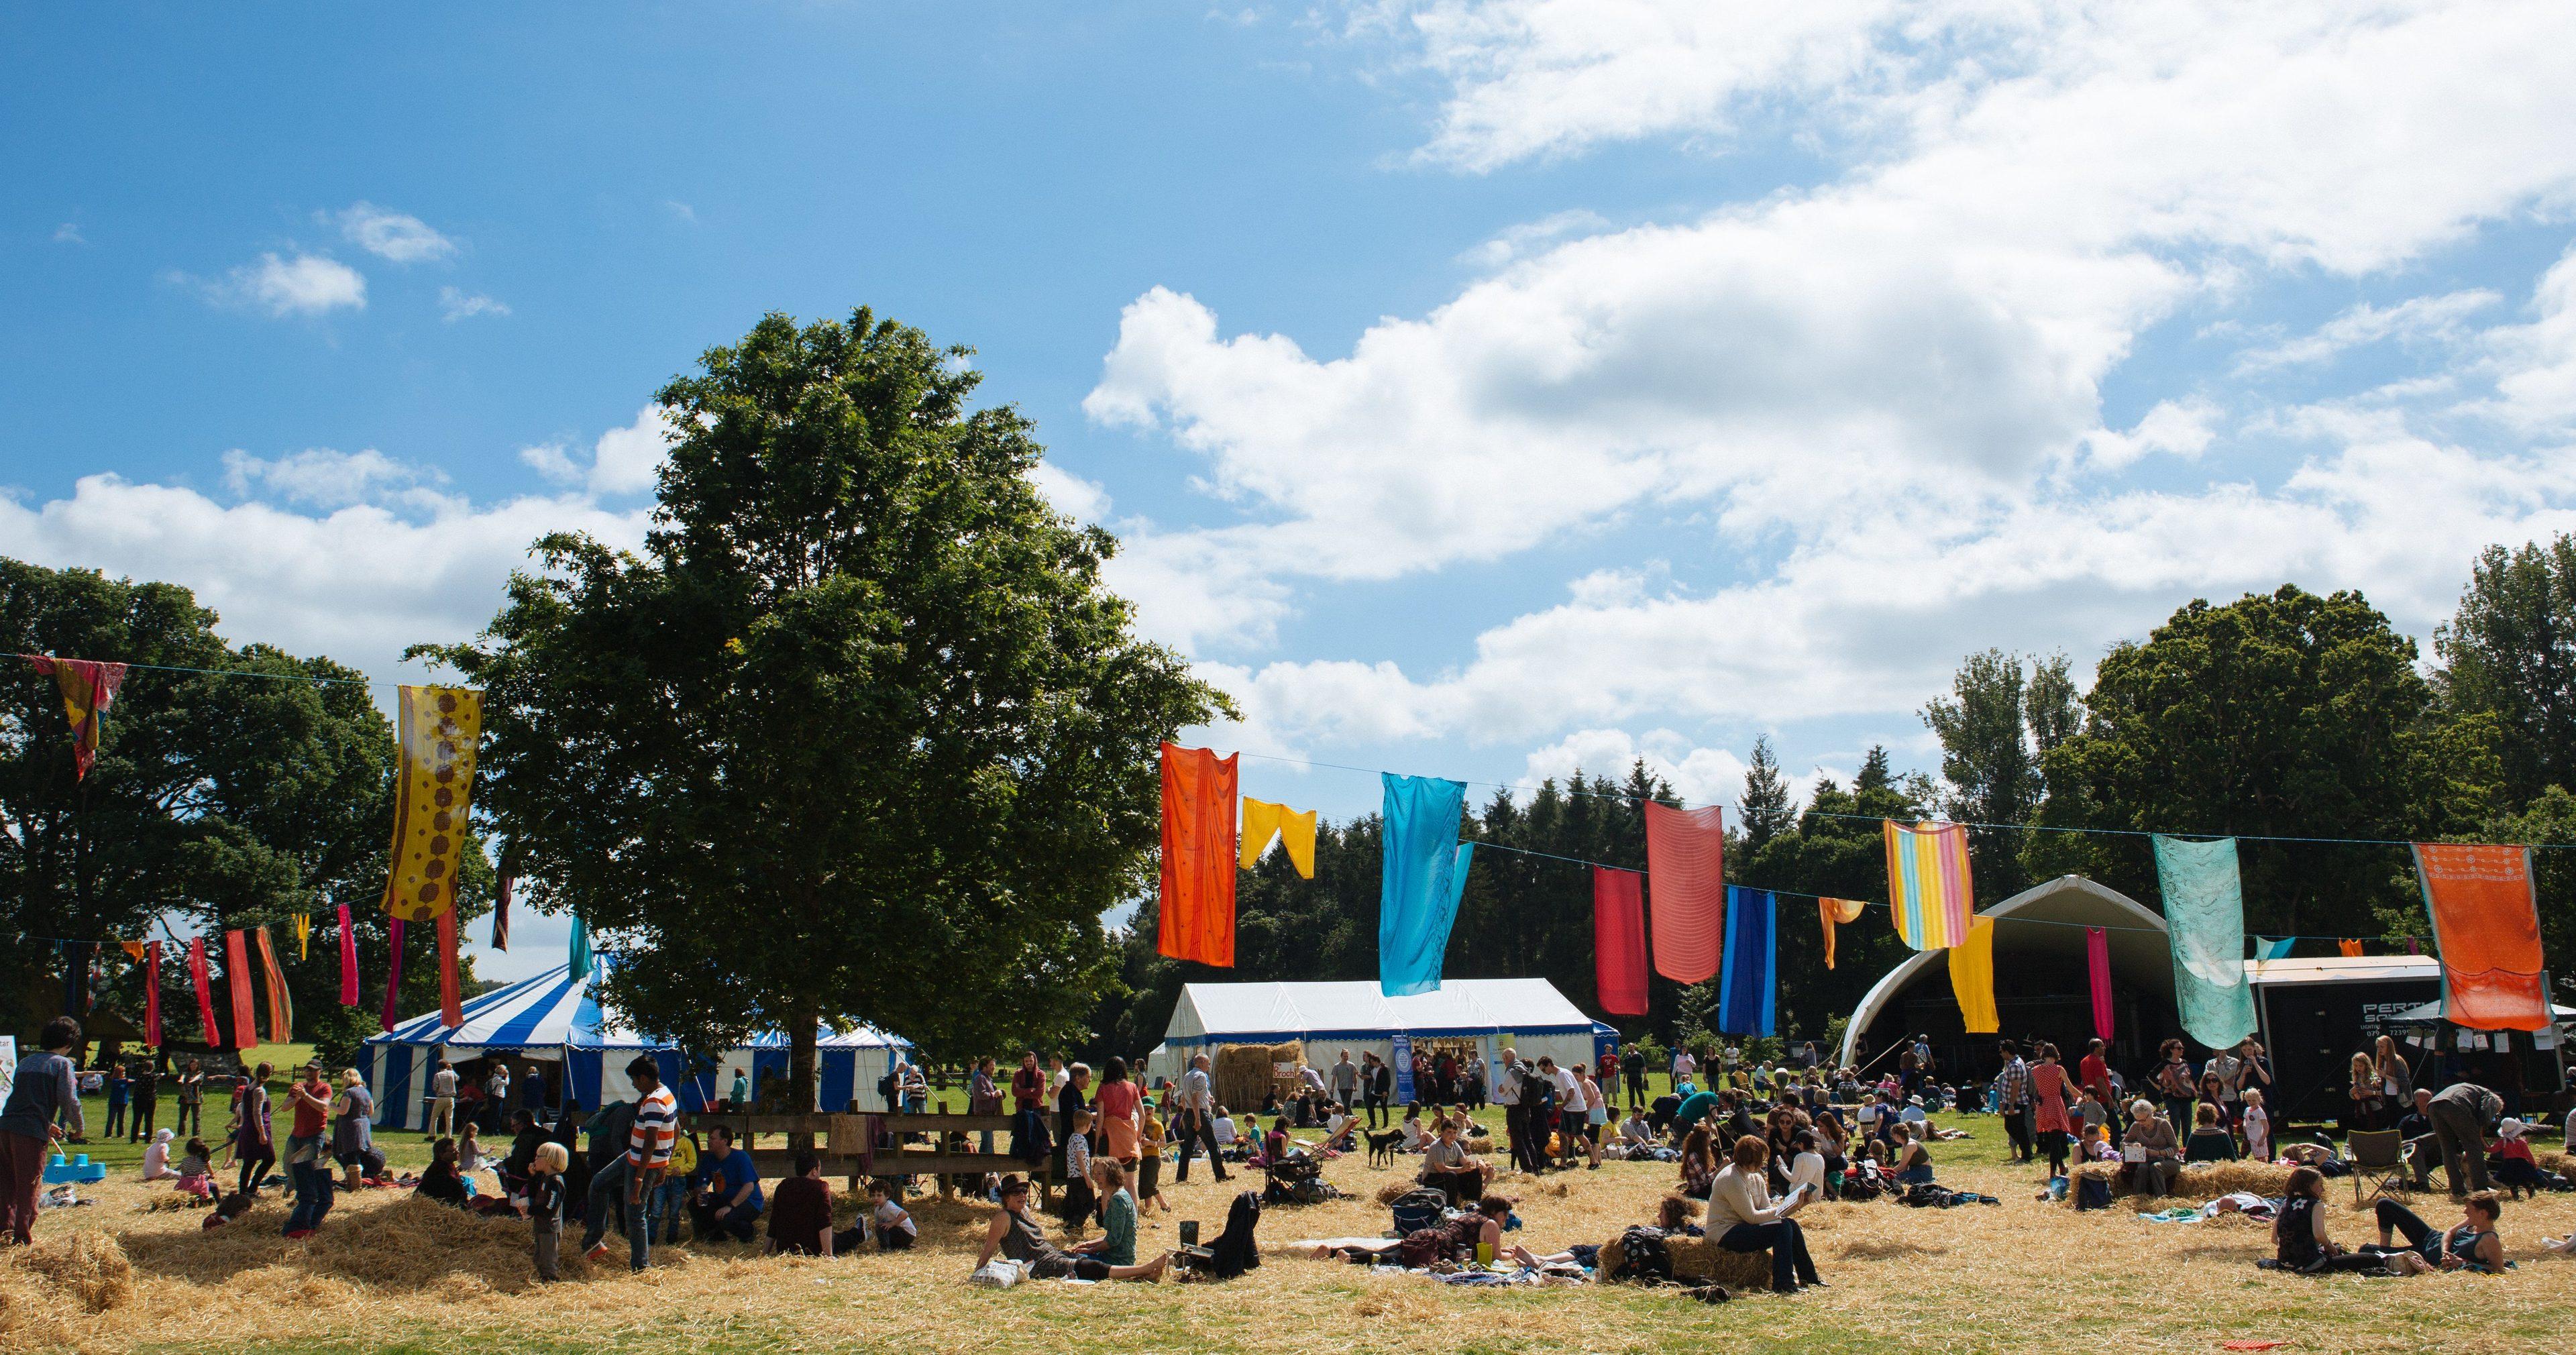 Last year's Solas Festival in Perthshire.